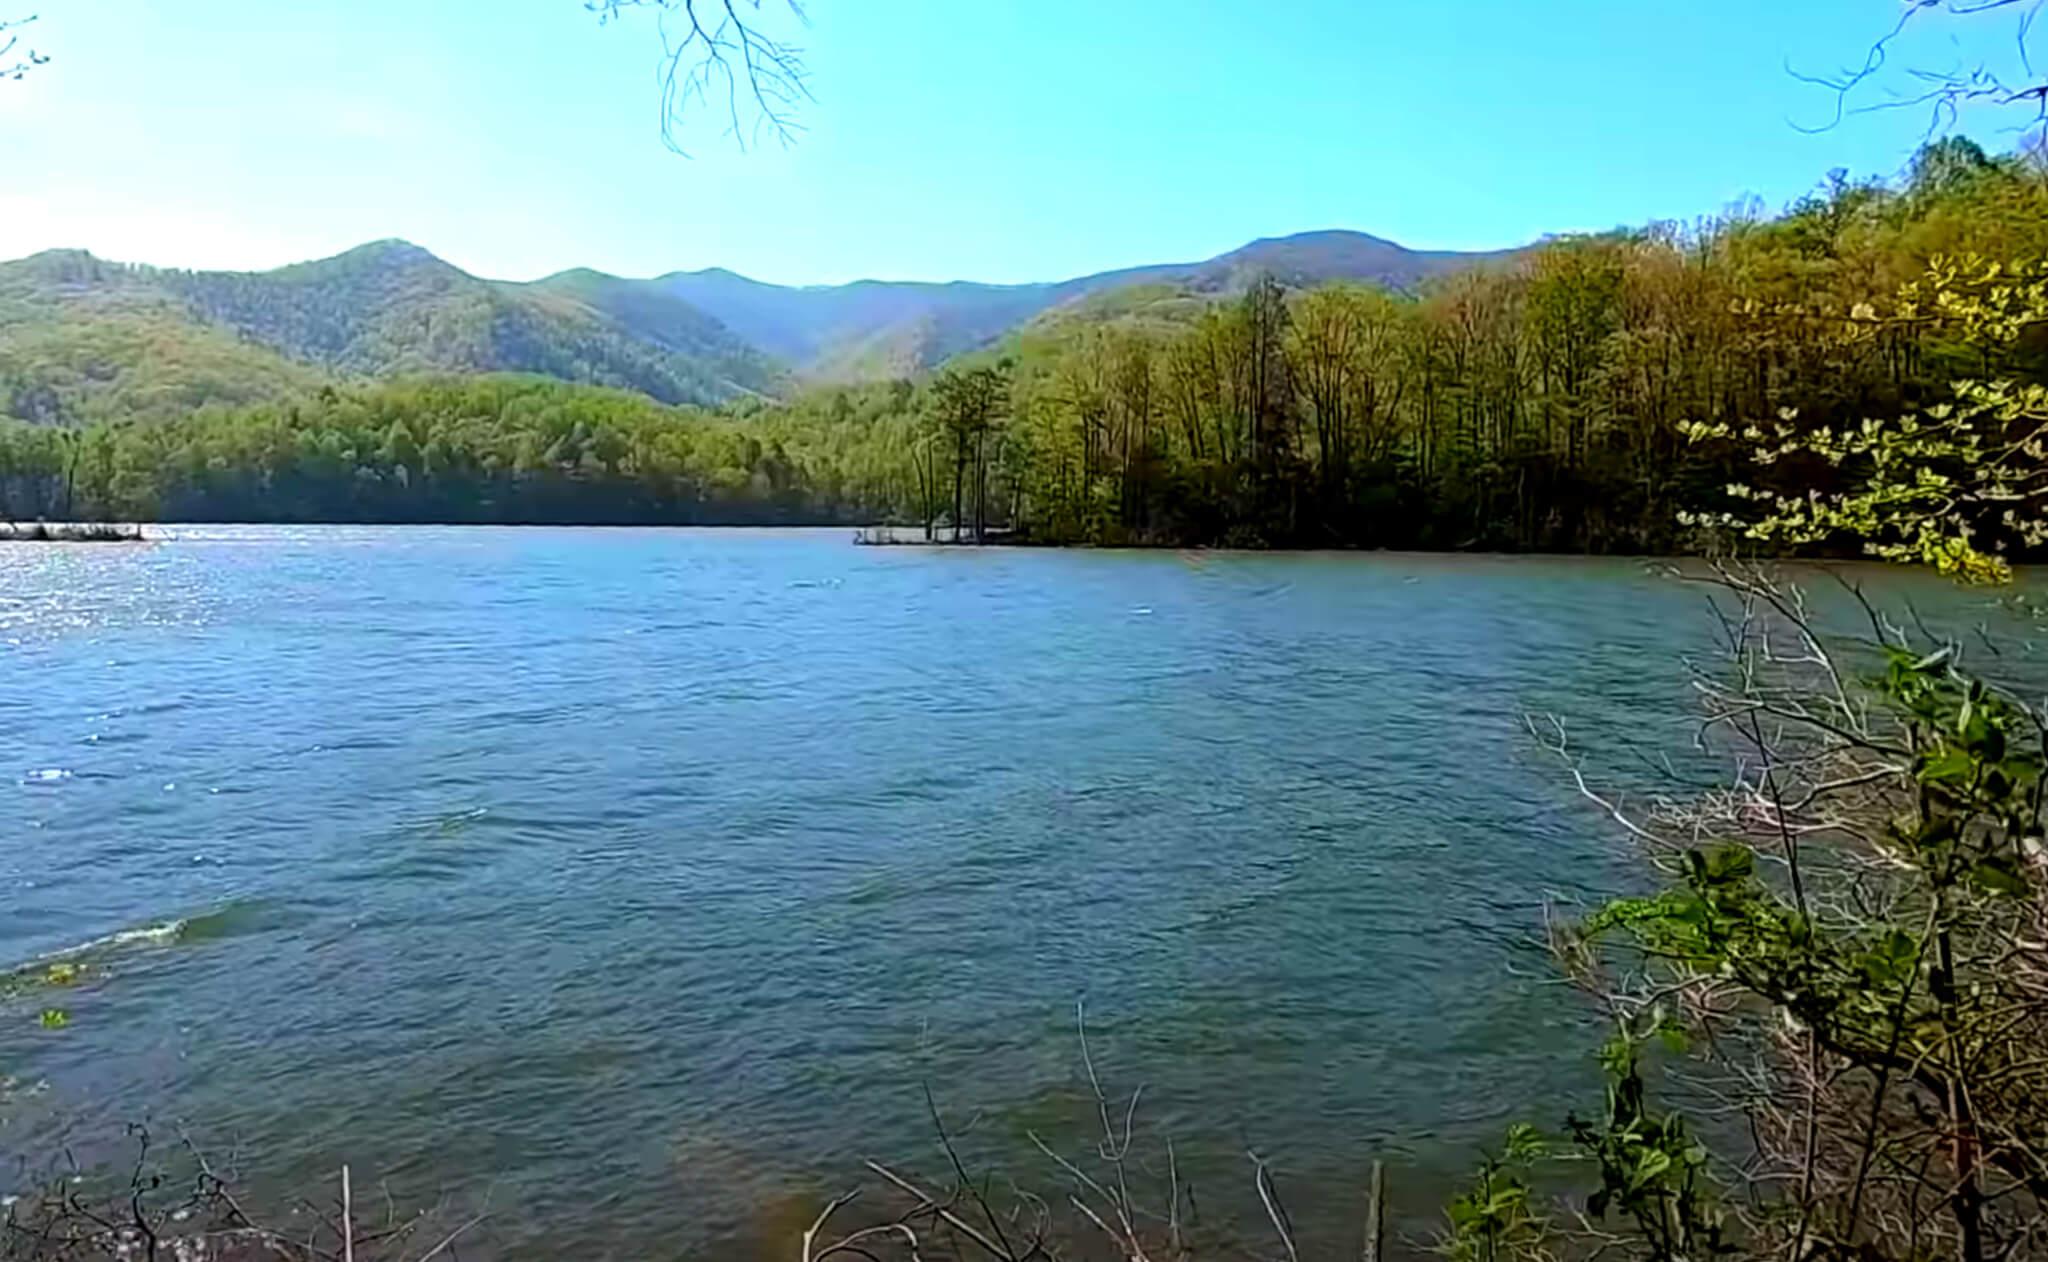 Watauga-Lake-Fishing-Report-Guide-Tennessee-TN-03